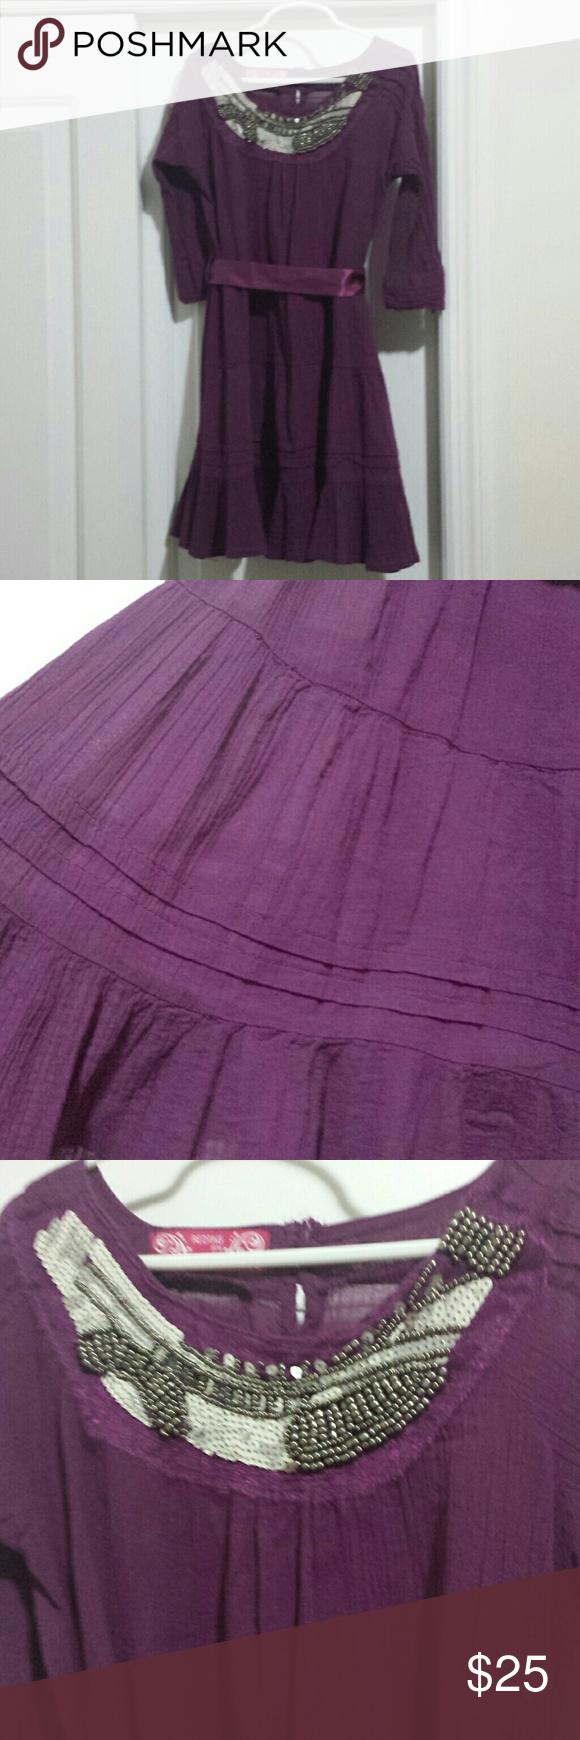 Little girls beaded boho dress beautiful dark purple dress for a